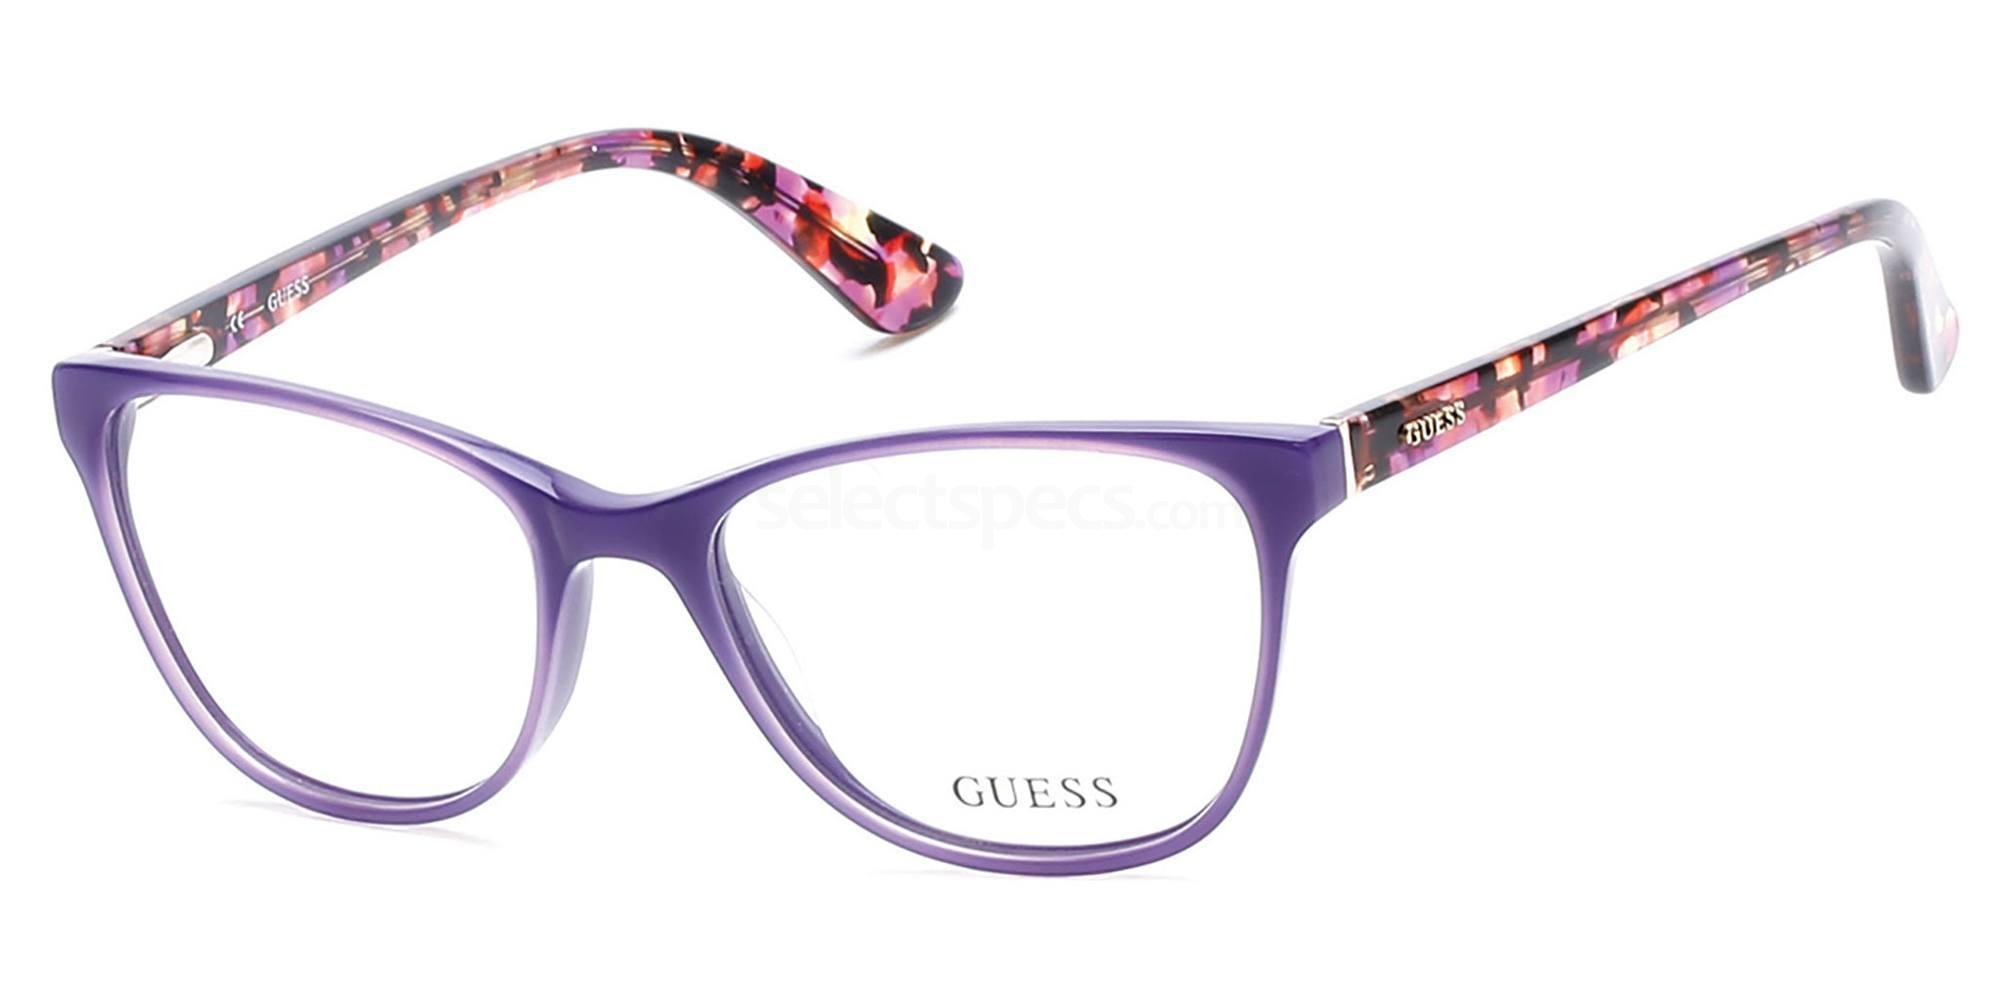 081 GU2547 Glasses, Guess